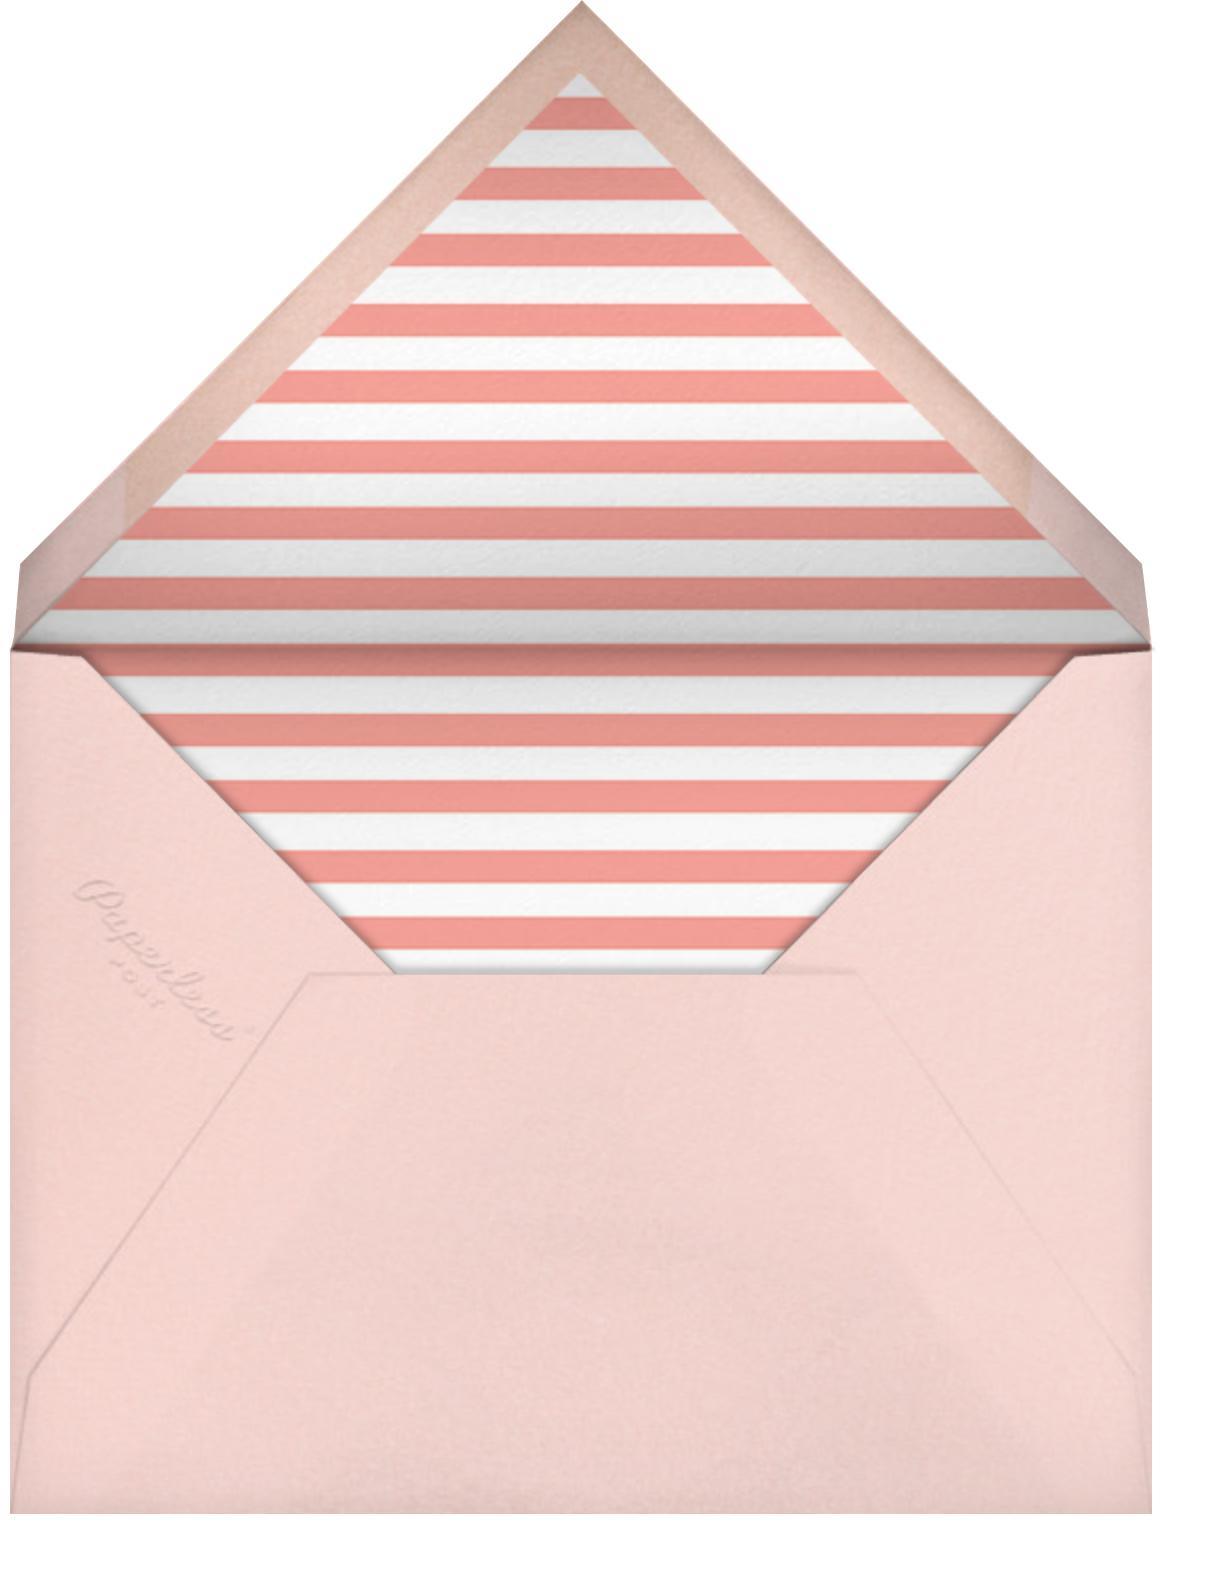 Quint - Papaya/Silver - Paperless Post - Kids' birthday - envelope back